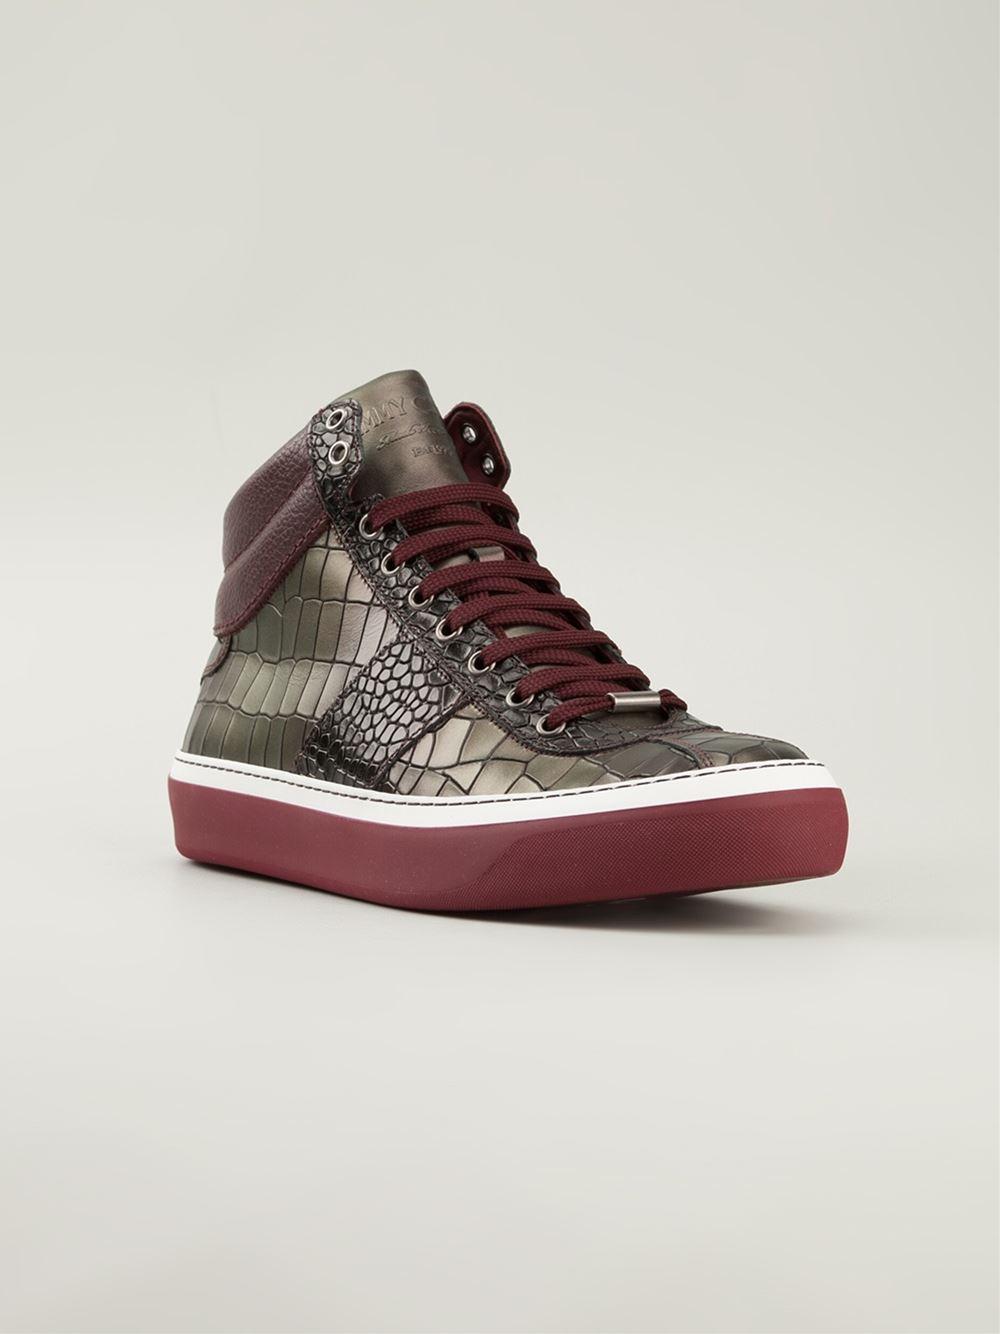 jimmy choo belgravia hitop sneakers in brown for men lyst. Black Bedroom Furniture Sets. Home Design Ideas